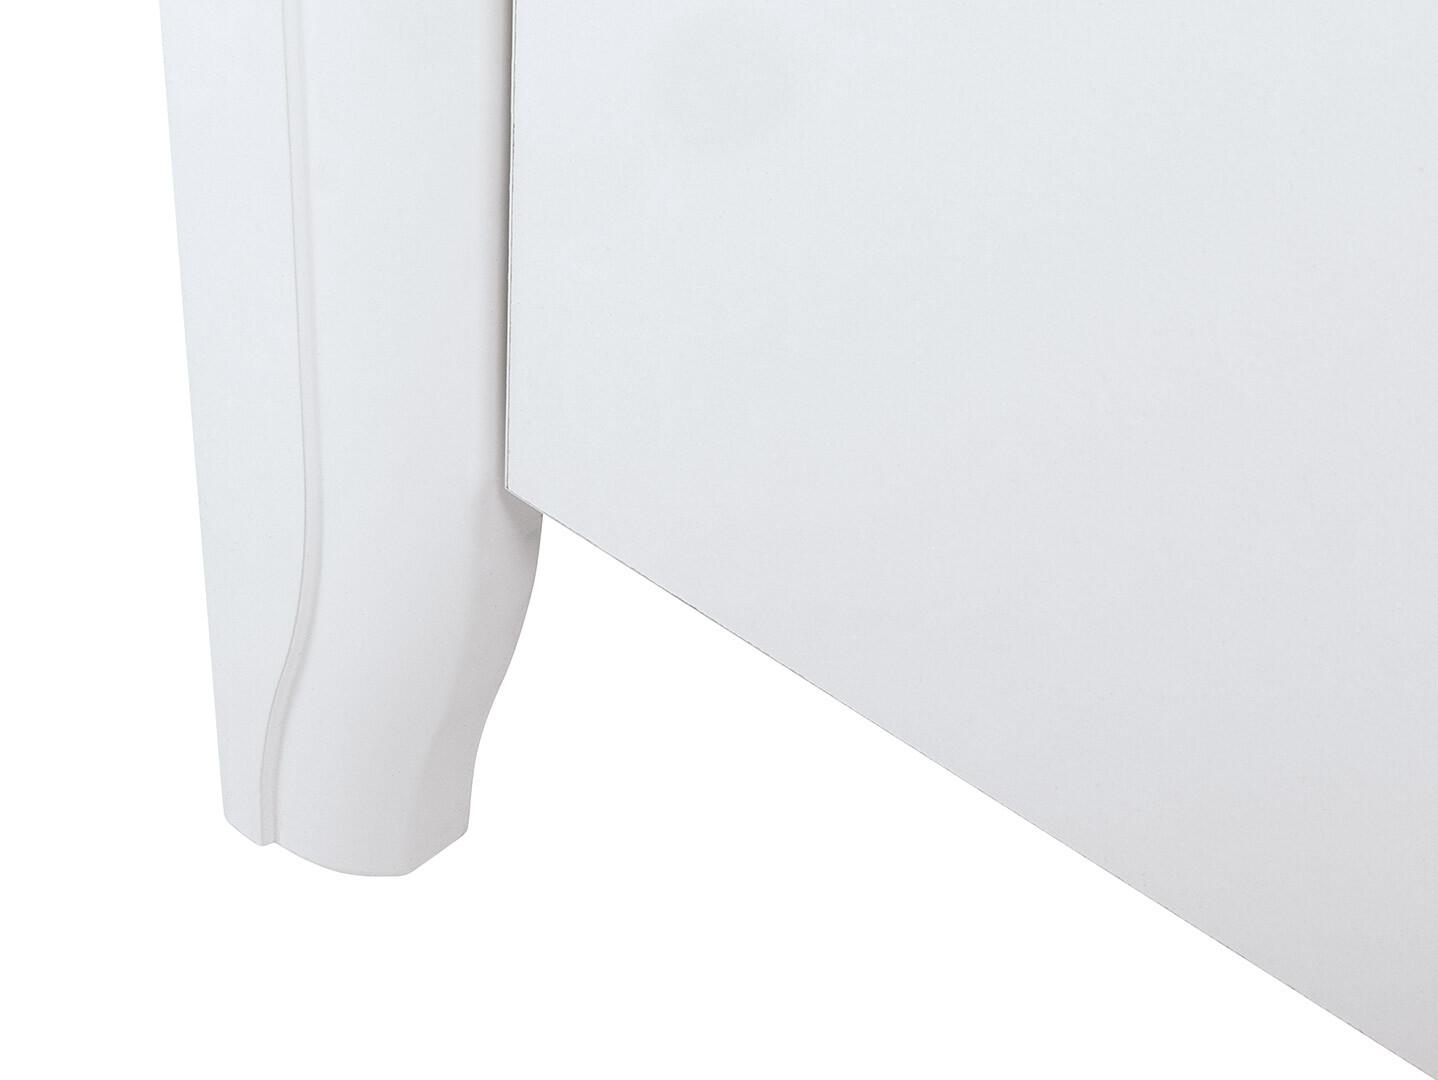 Skriňa KALIO SZF6D2S biely lesk/ akácia zlatá/ biely lesk